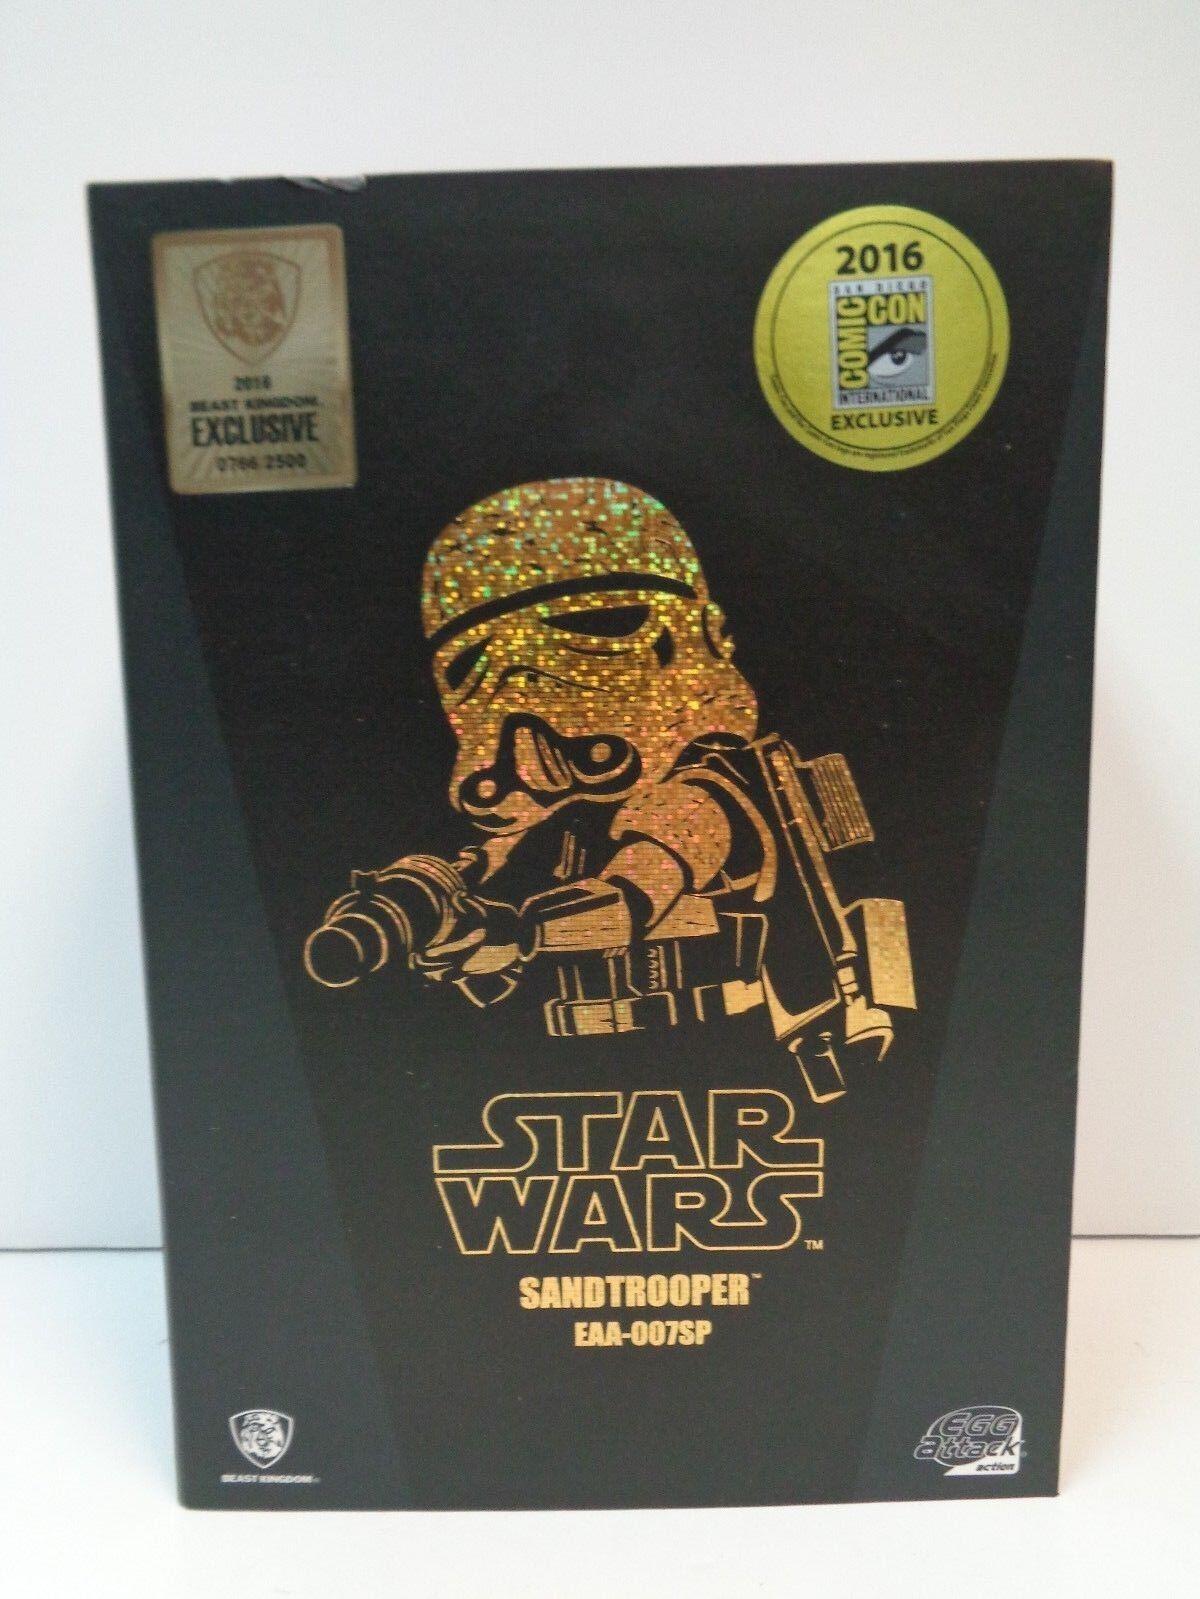 Star Wars SANDTROOPER SANDTROOPER SANDTROOPER EAA-007SP - 2016 Beast Kingdom Exclusive 0766 2500 SDCC a1189b